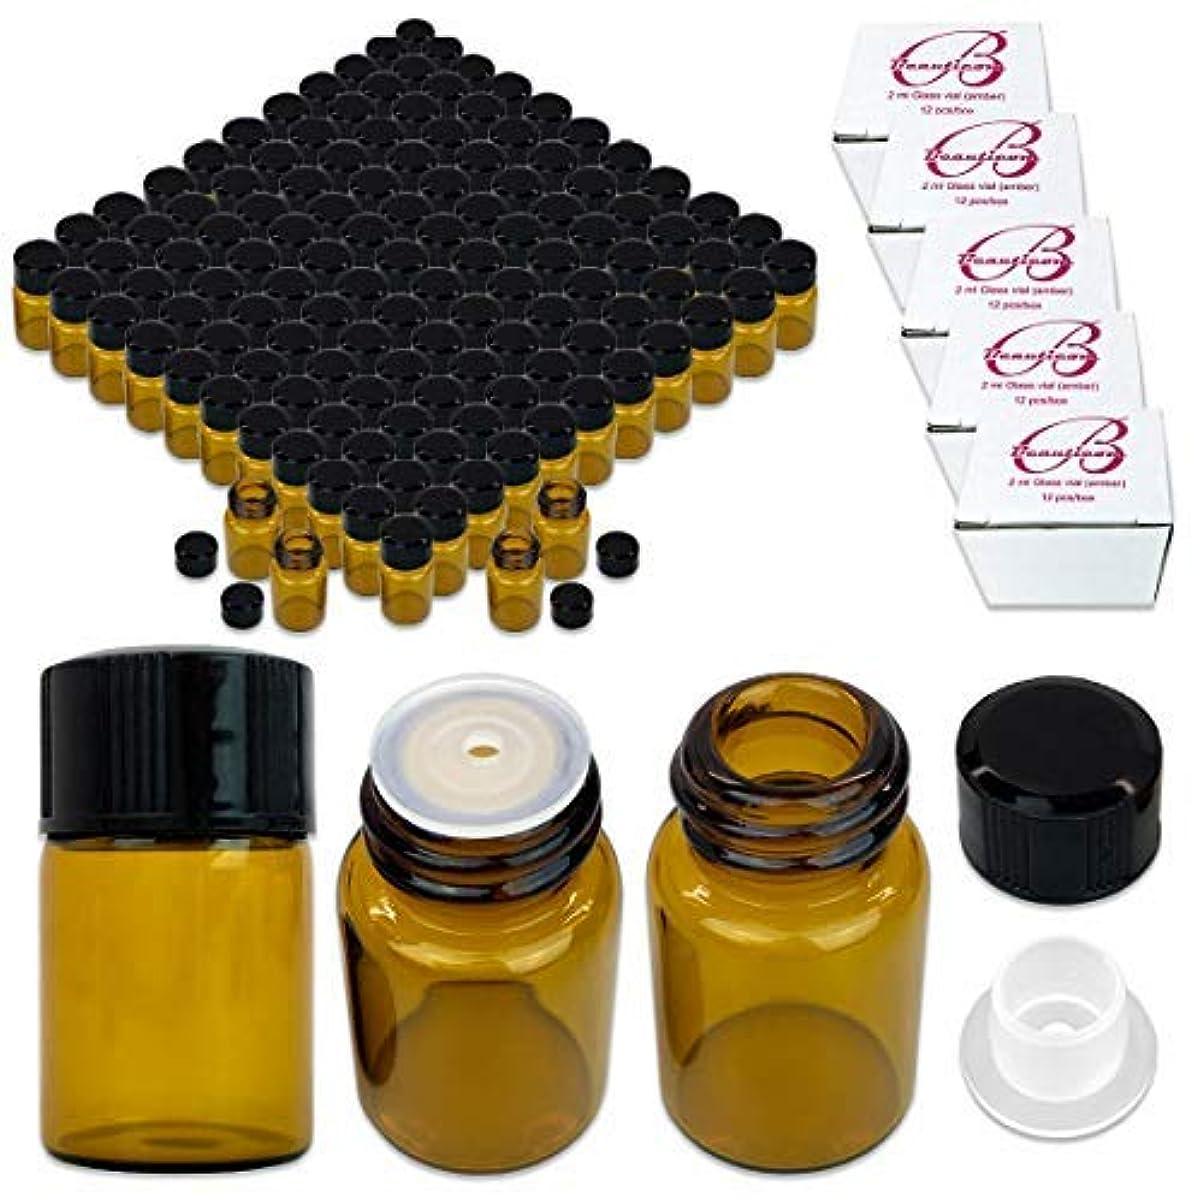 運河対話情緒的180 Packs Beauticom 2ML Amber Glass Vial for Essential Oils, Aromatherapy, Fragrance, Serums, Spritzes, with Orifice...